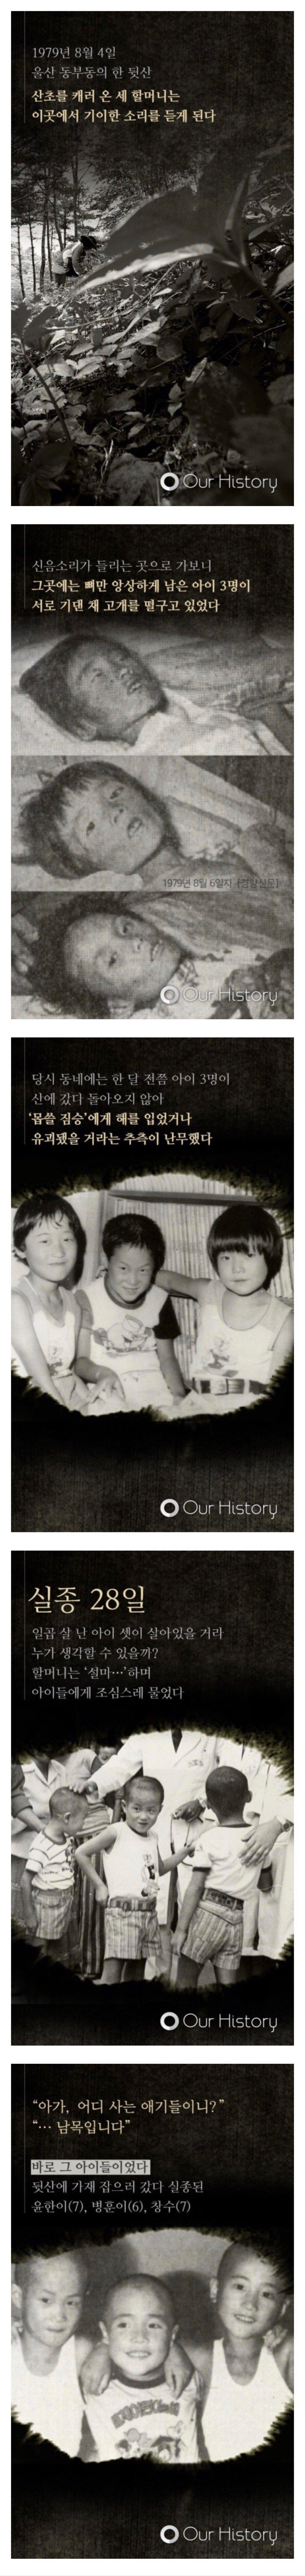 1.jpeg 1979년, 실종 28일만에 발견된 아이들